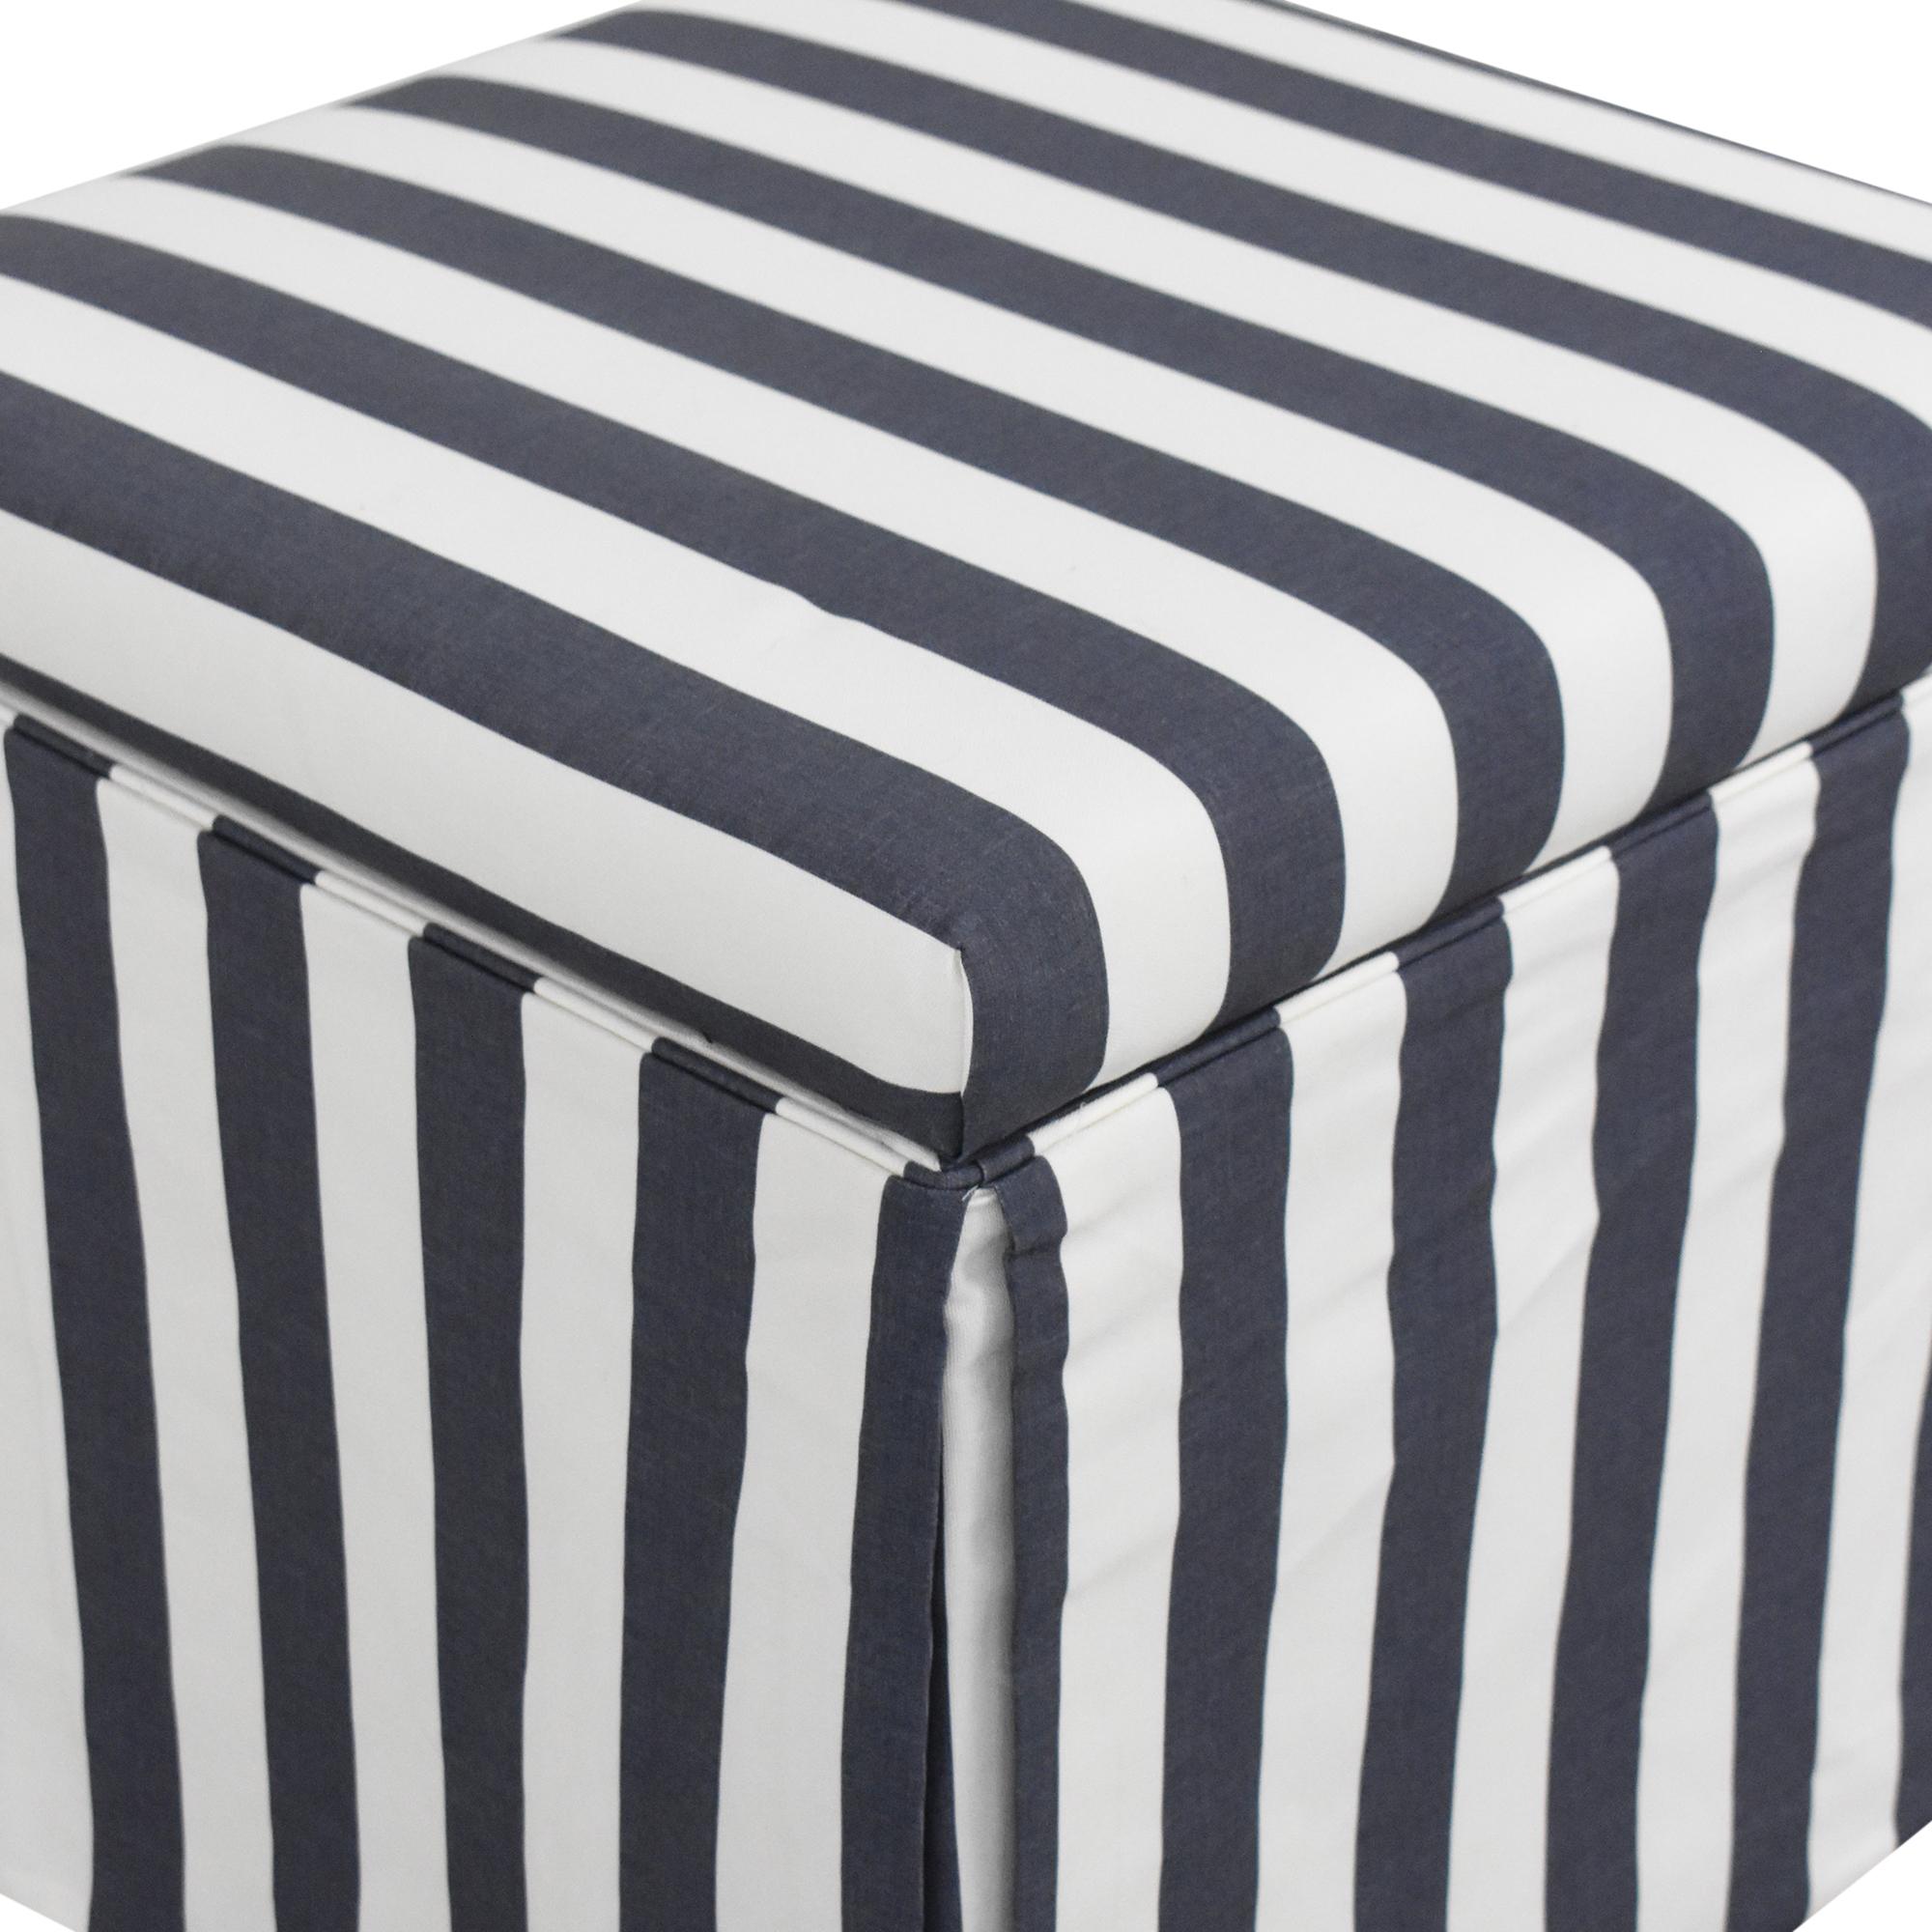 buy The Inside The Inside Cabana Stripe Skirted Storage Ottoman online